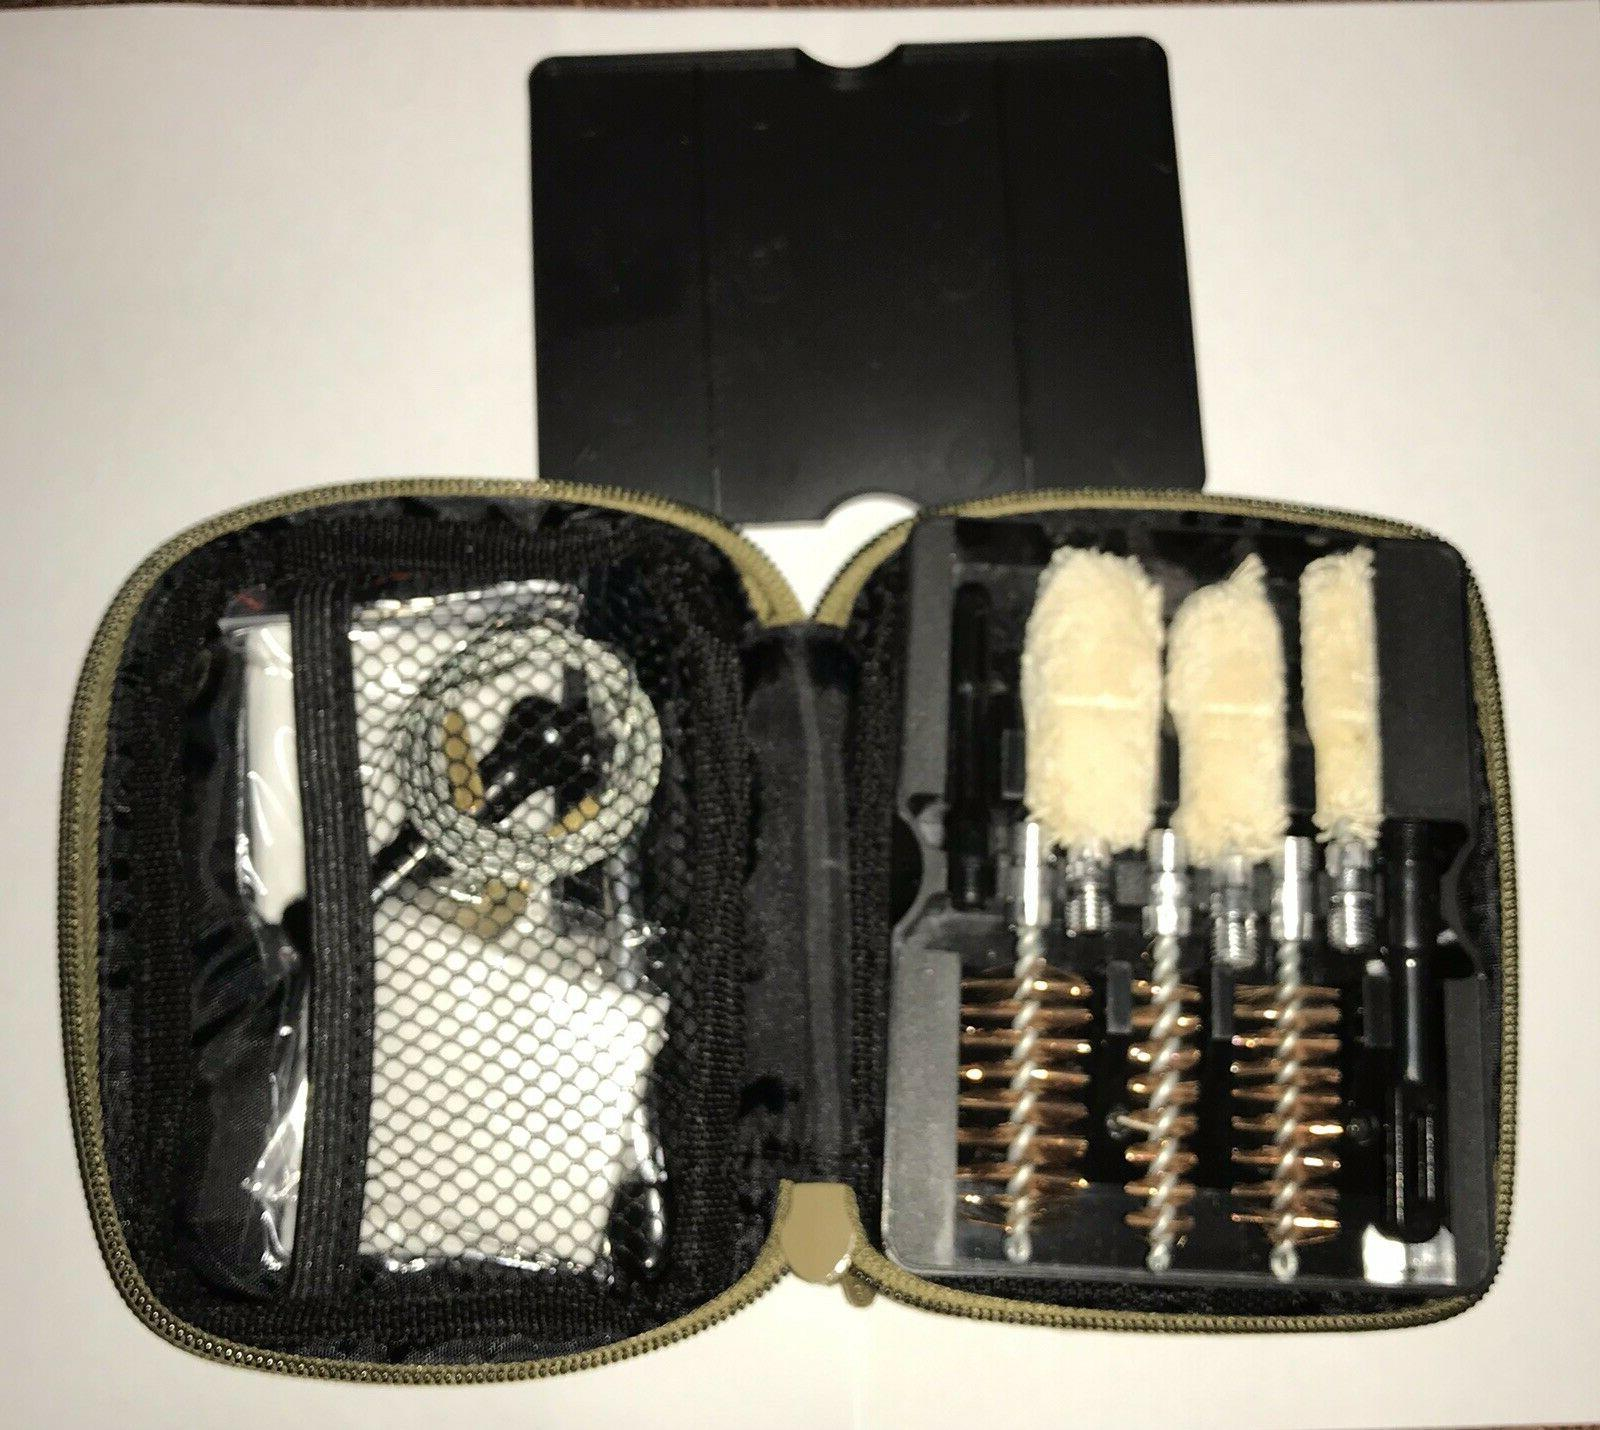 ABKT Shotgun Kit. For &.12 Shotguns.